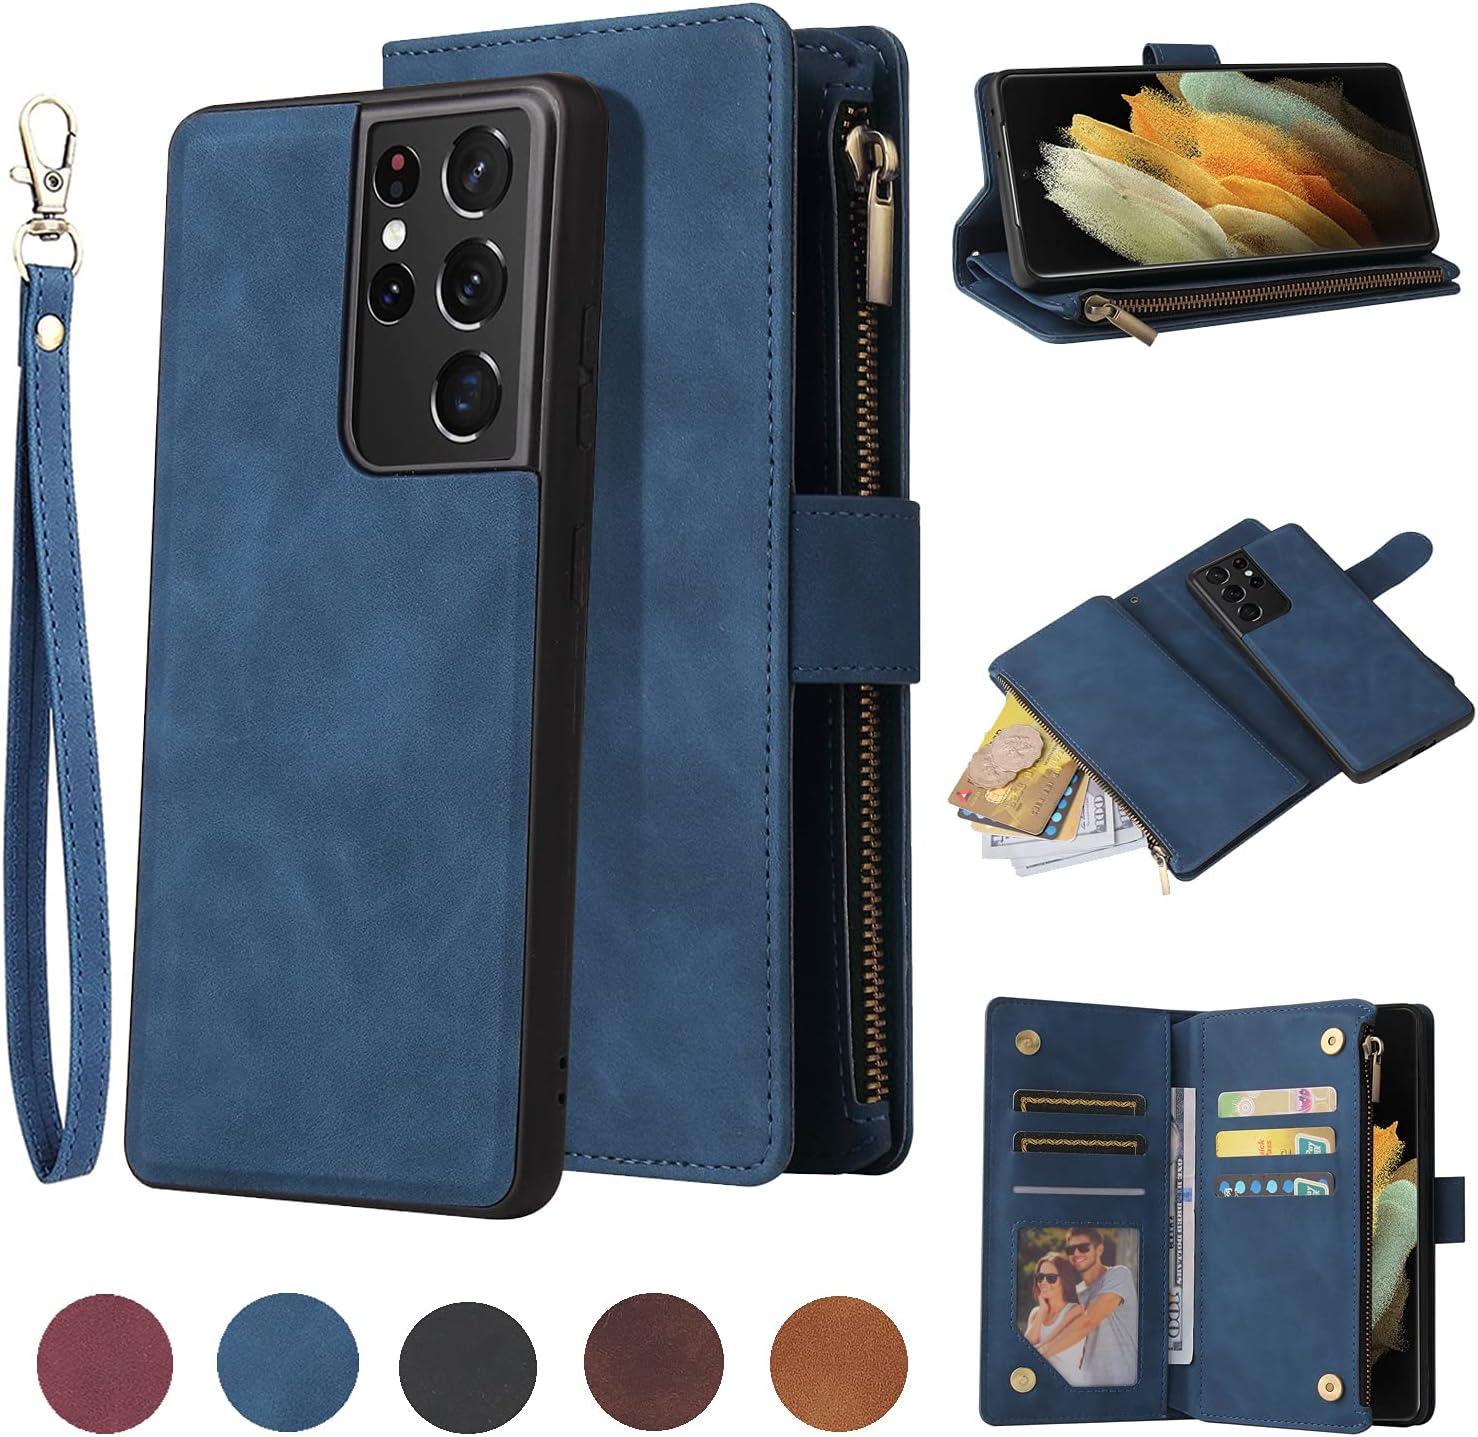 LBYZCASE Wallet Case for Galaxy S21,Samsung S21 Case,Folio Flip Premium Leather Zipper Pocket Magnetic Detachable Case Cover[Card Slots][Wrist Strap] for Samsung Galaxy S21(Blue)